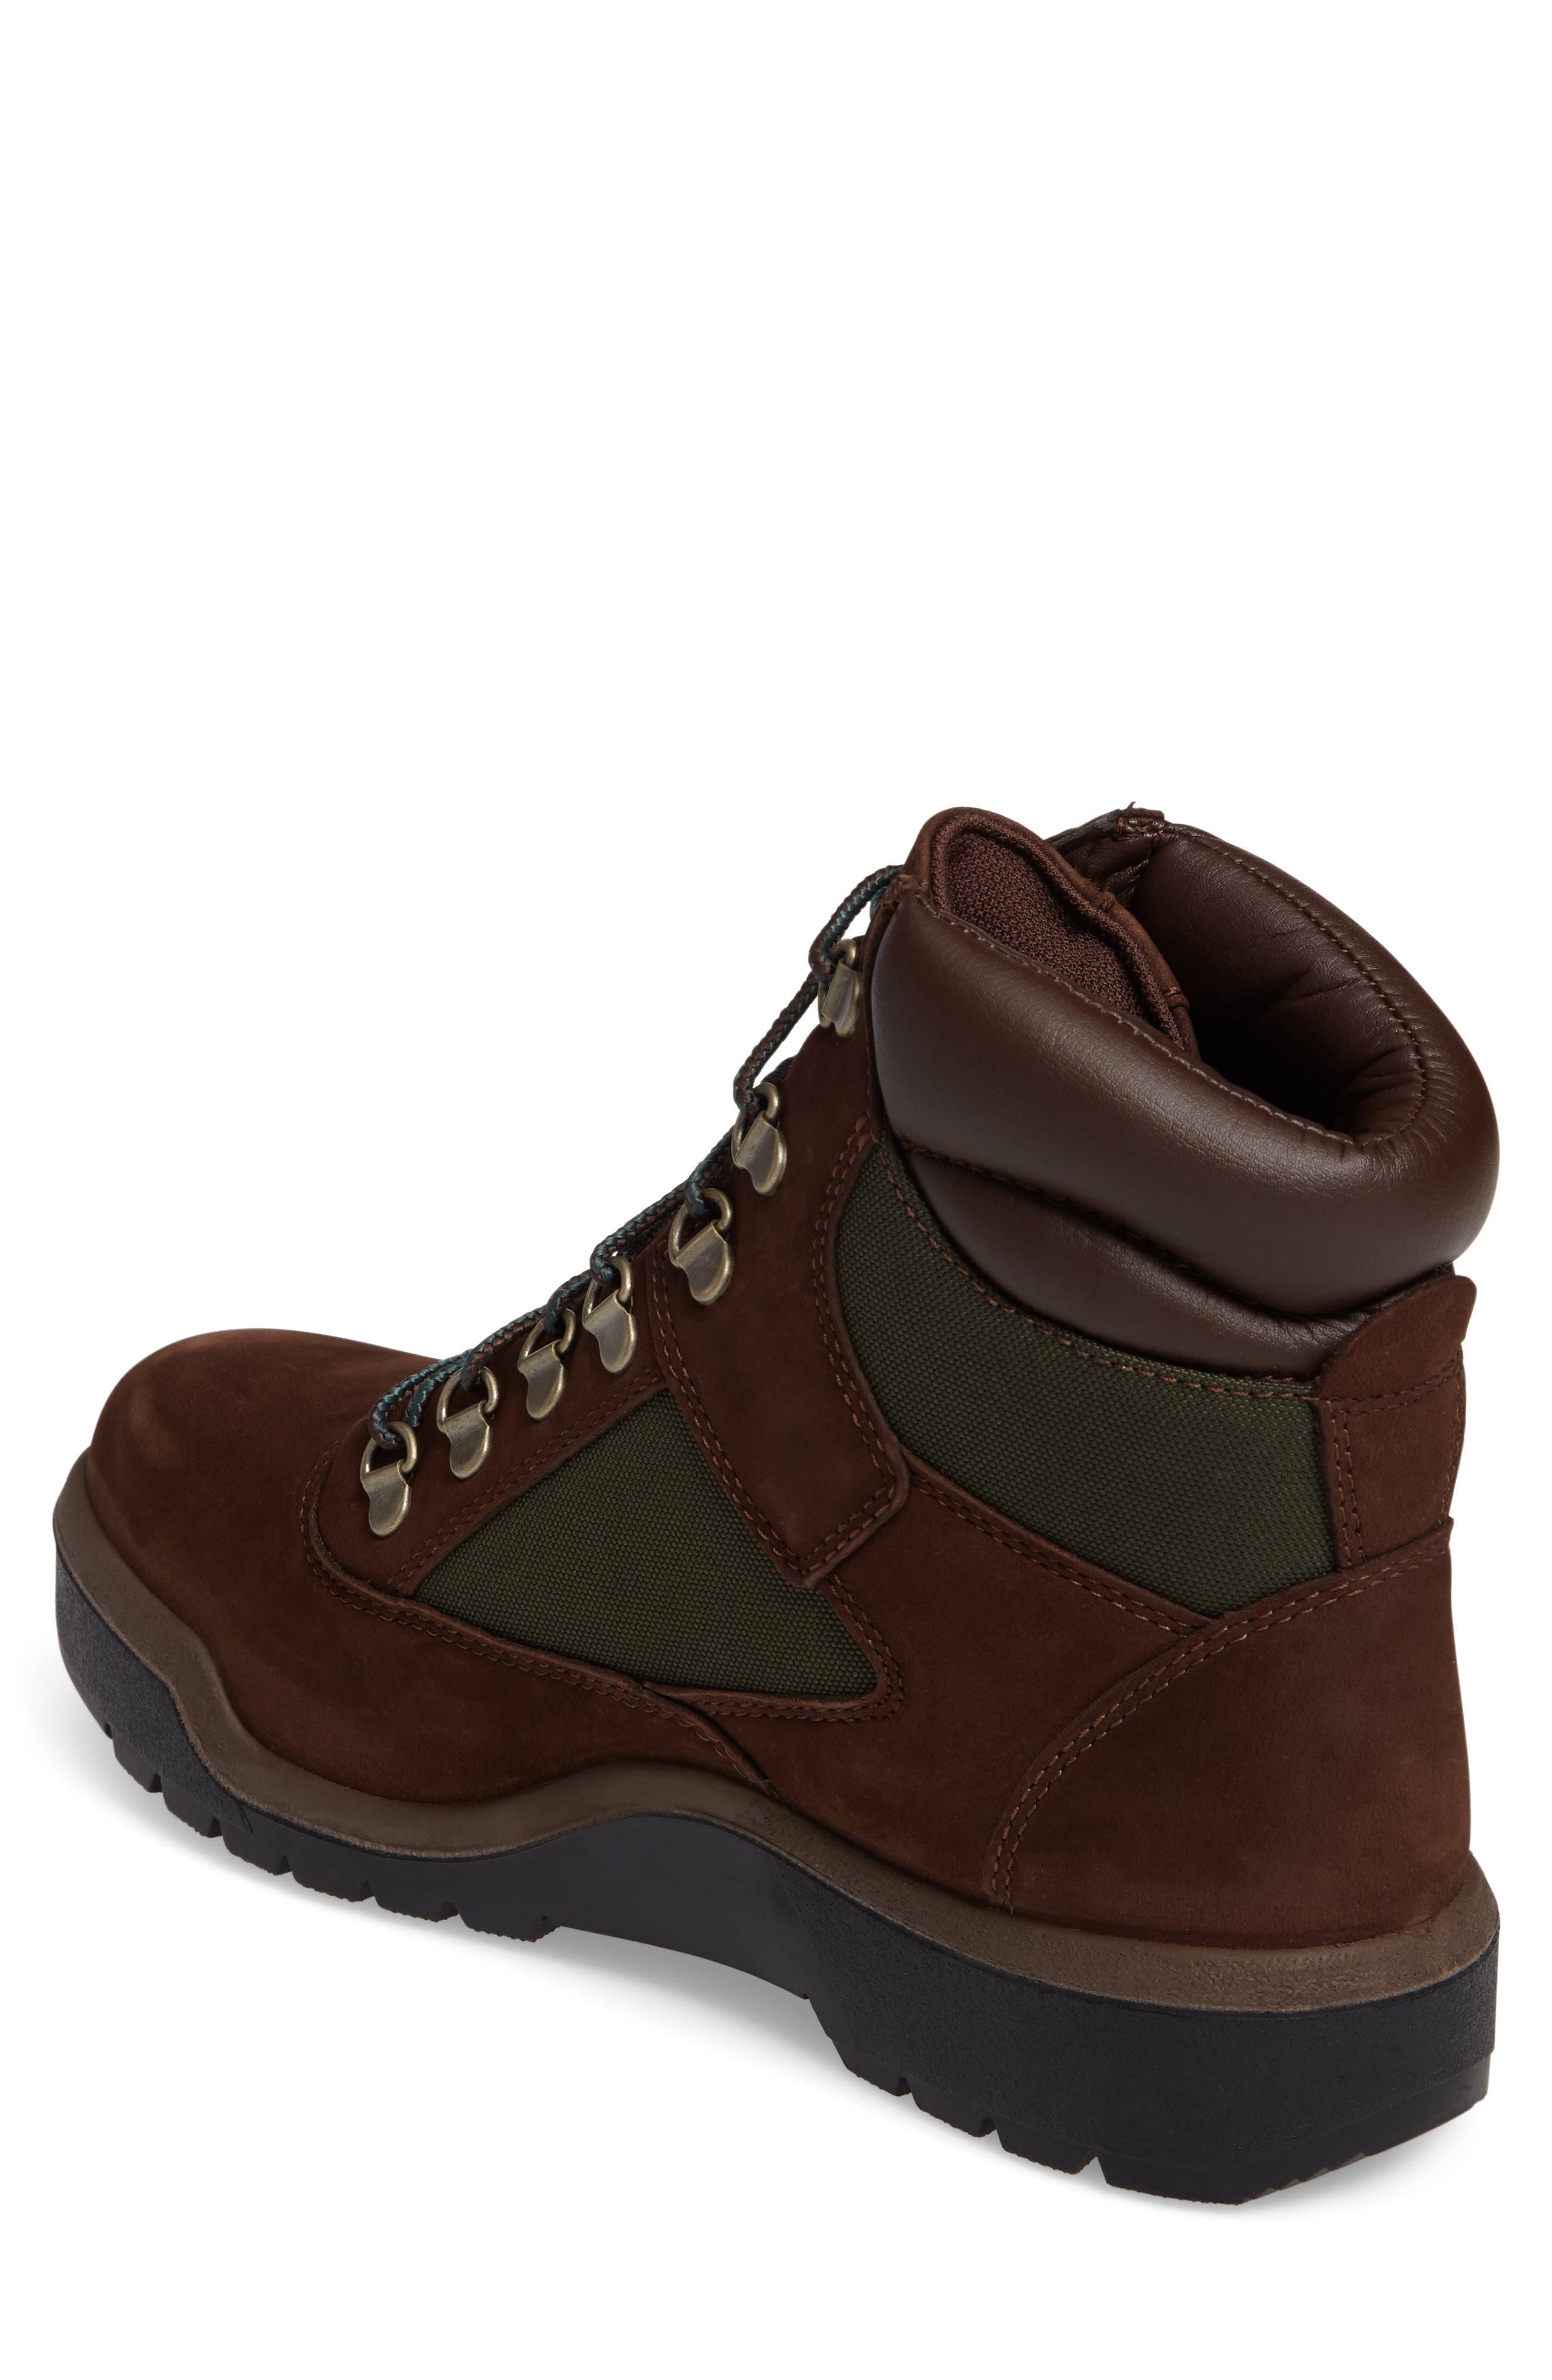 Field Waterproof Boot,                             Alternate thumbnail 15, color,